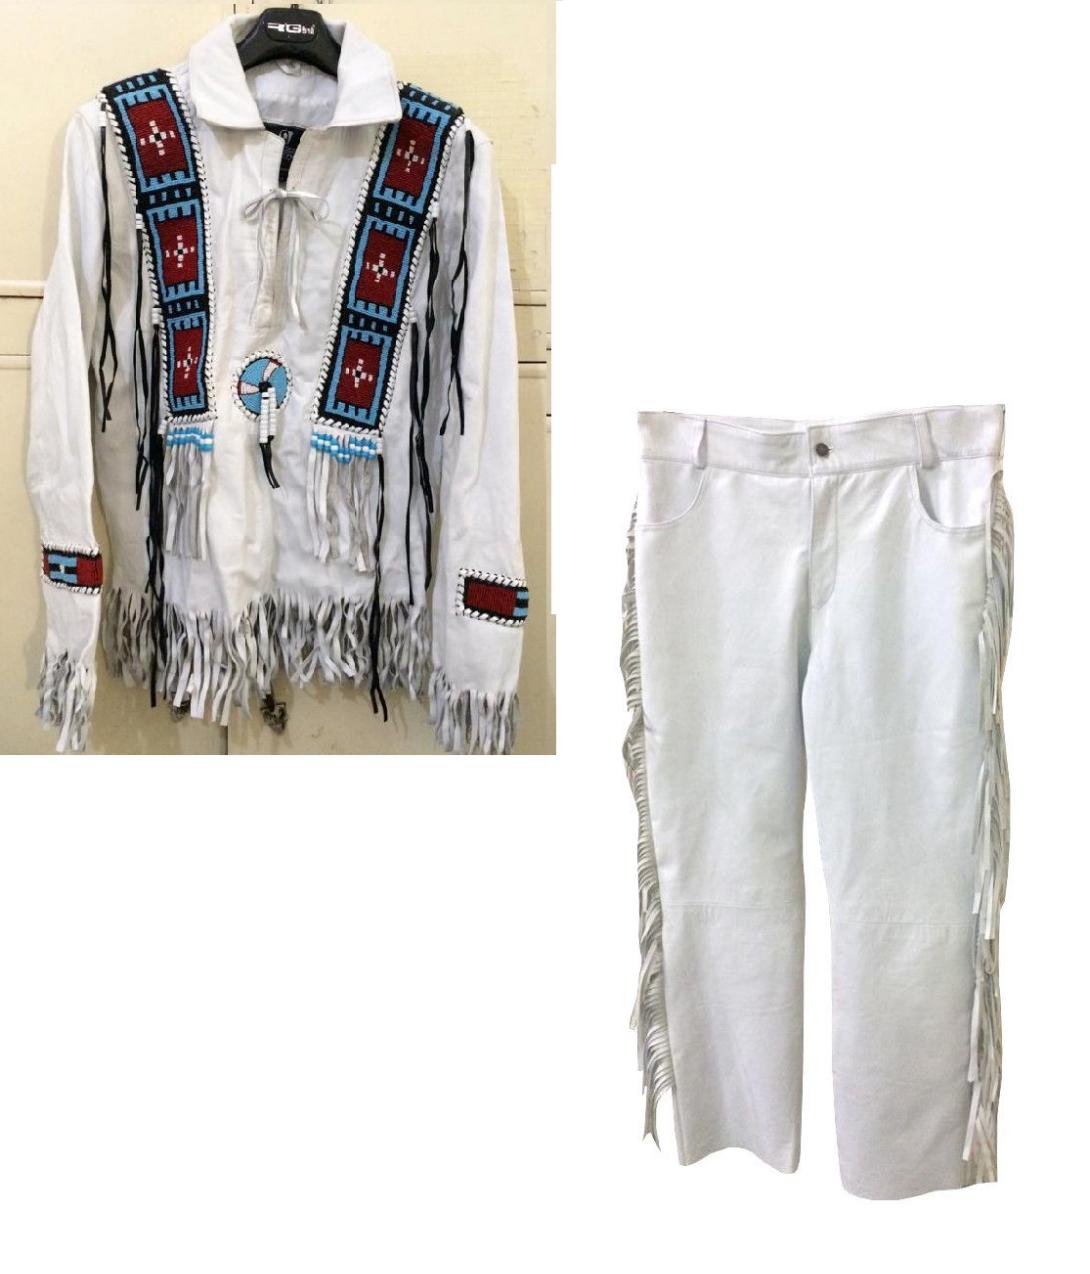 Men's New Native American Buckskin White Leather Beads Hippie Shirt & Pant WS72